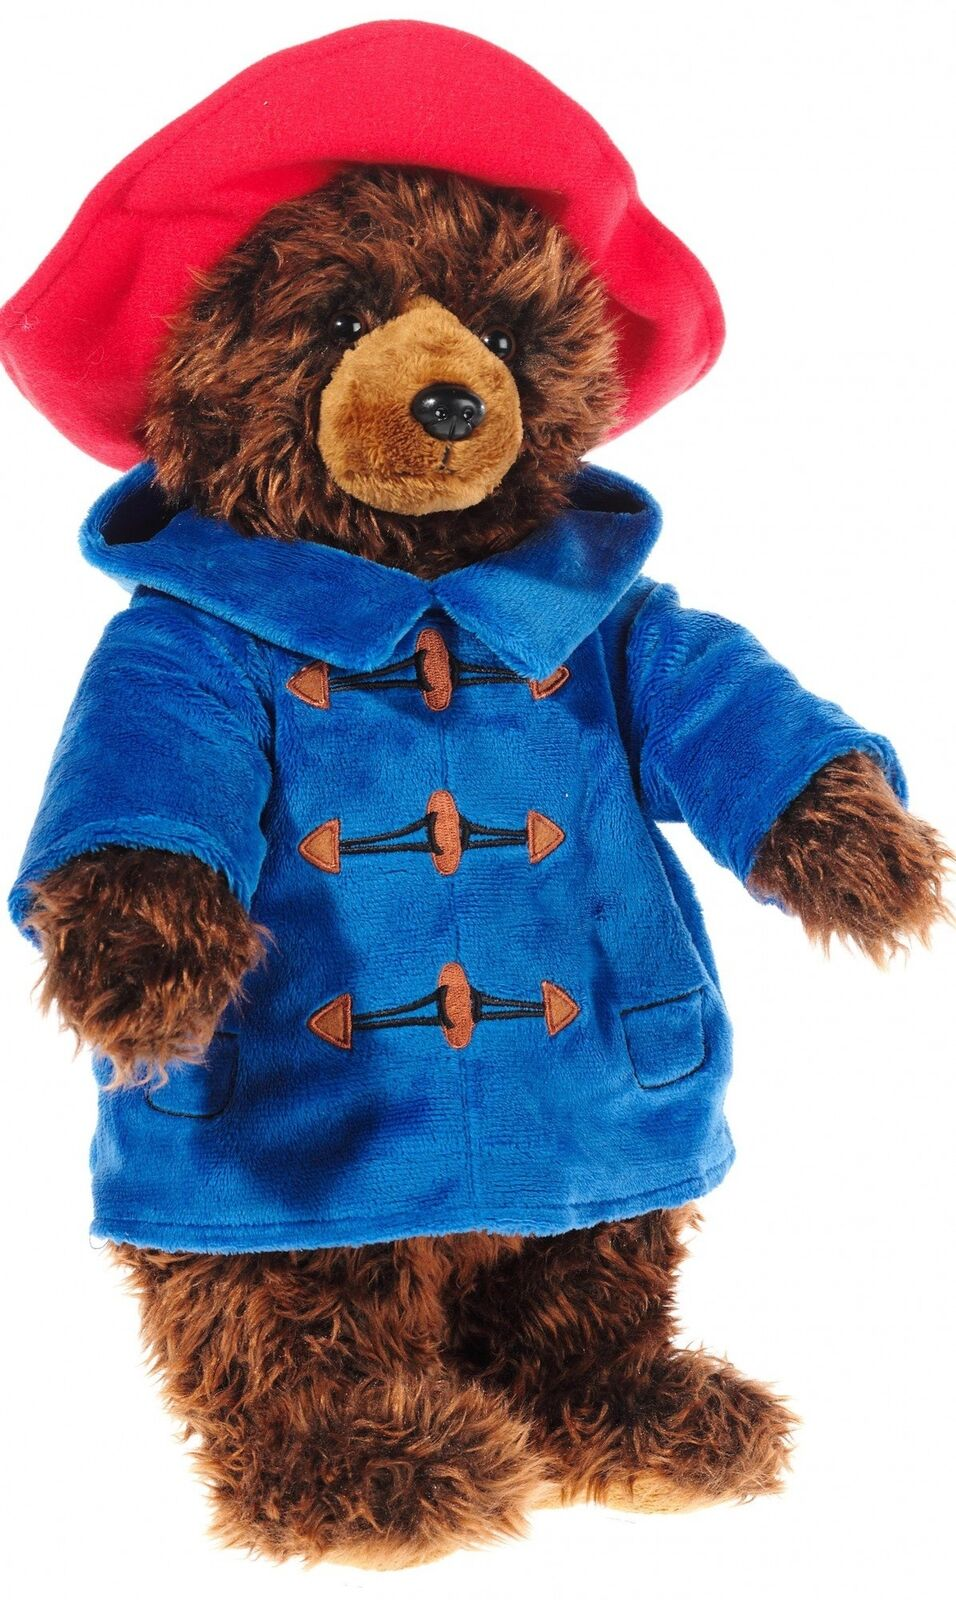 Heunec Paddington 608276–The Official Mascot of Cinema Movie Paddington Bea...